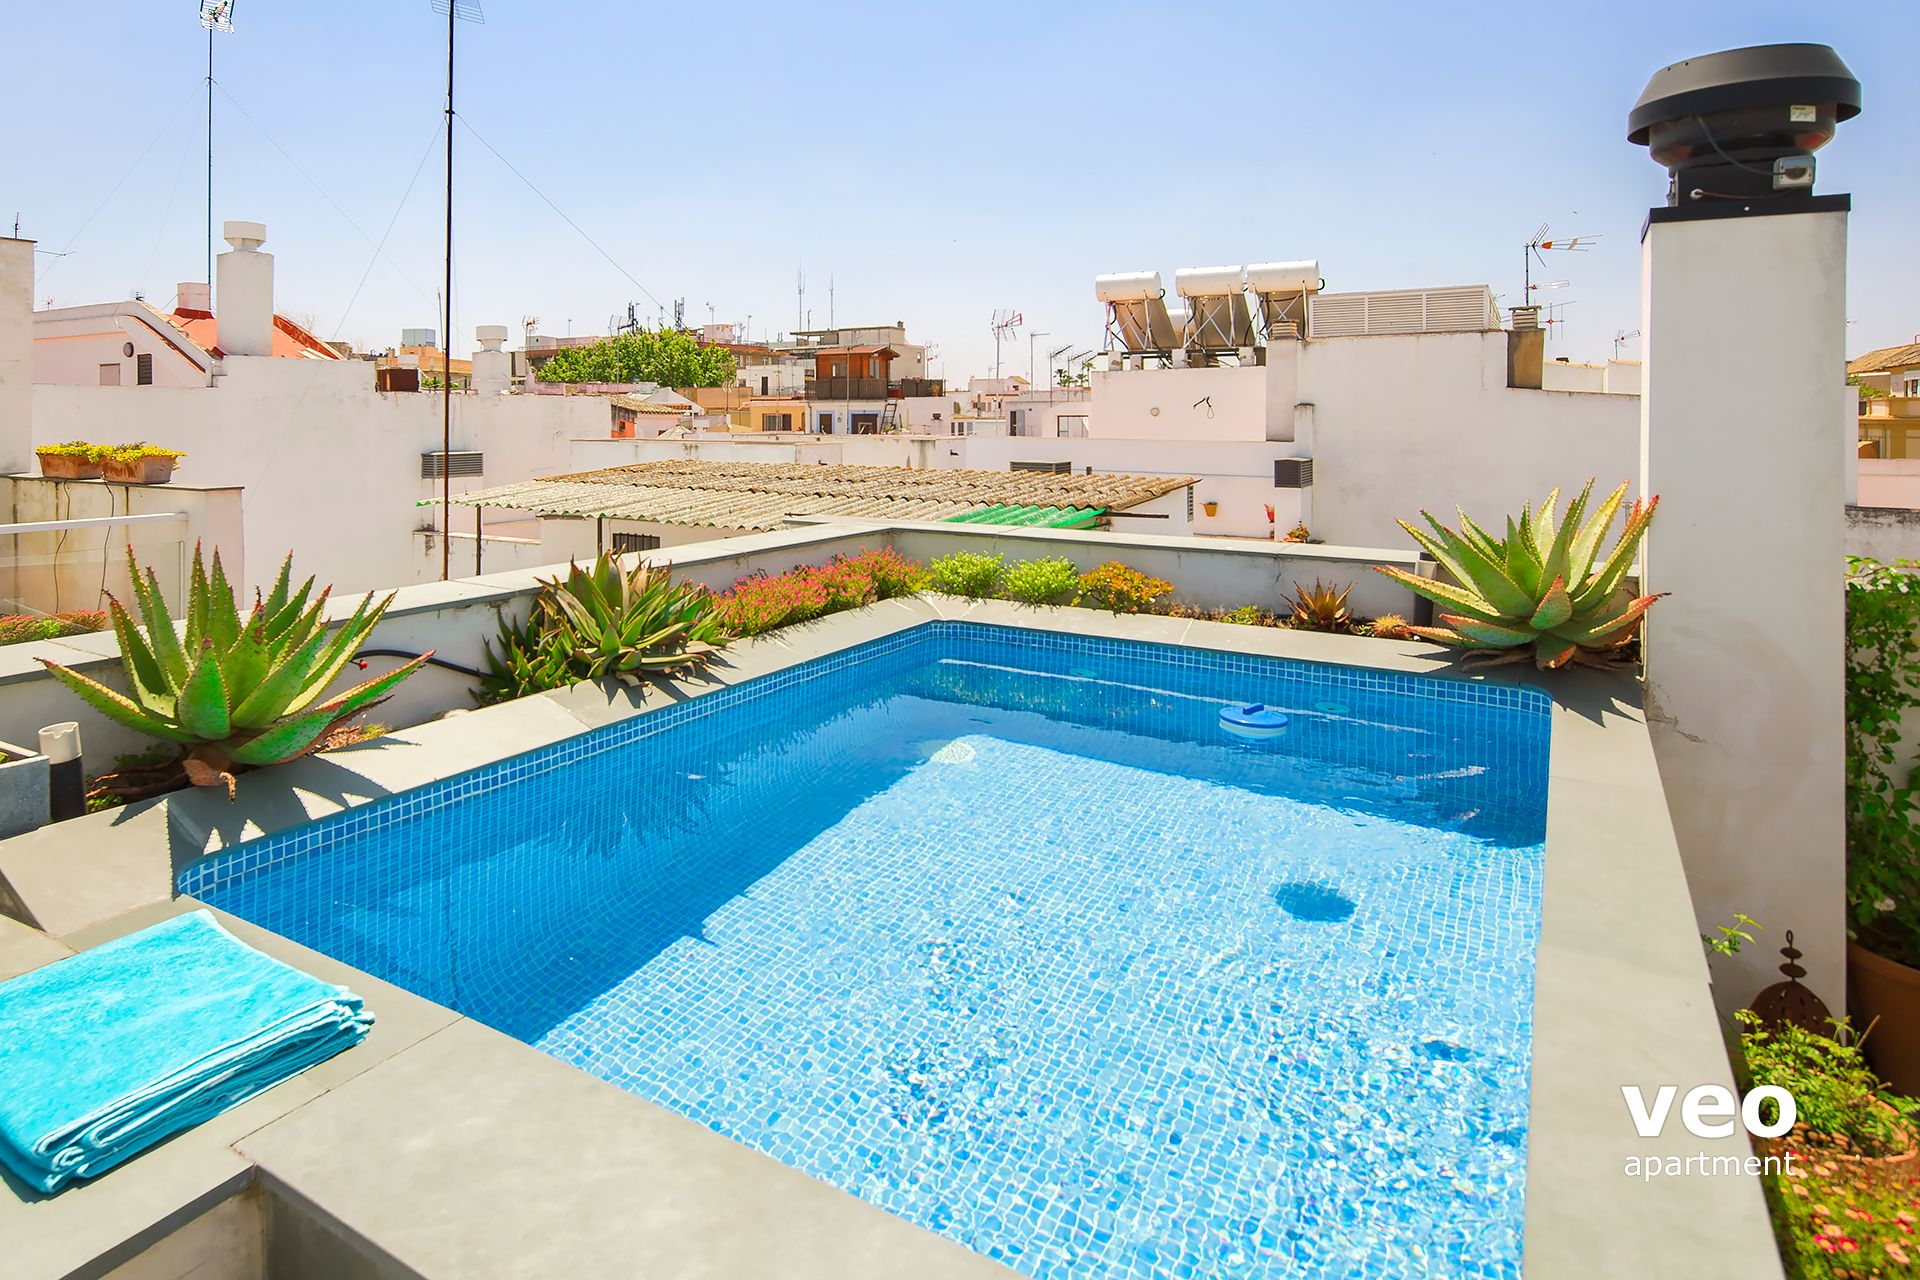 Appartement rue teodosio s ville espagne teodosio terrasse location d 39 appartement - Piscinas desmontables 3x2 ...